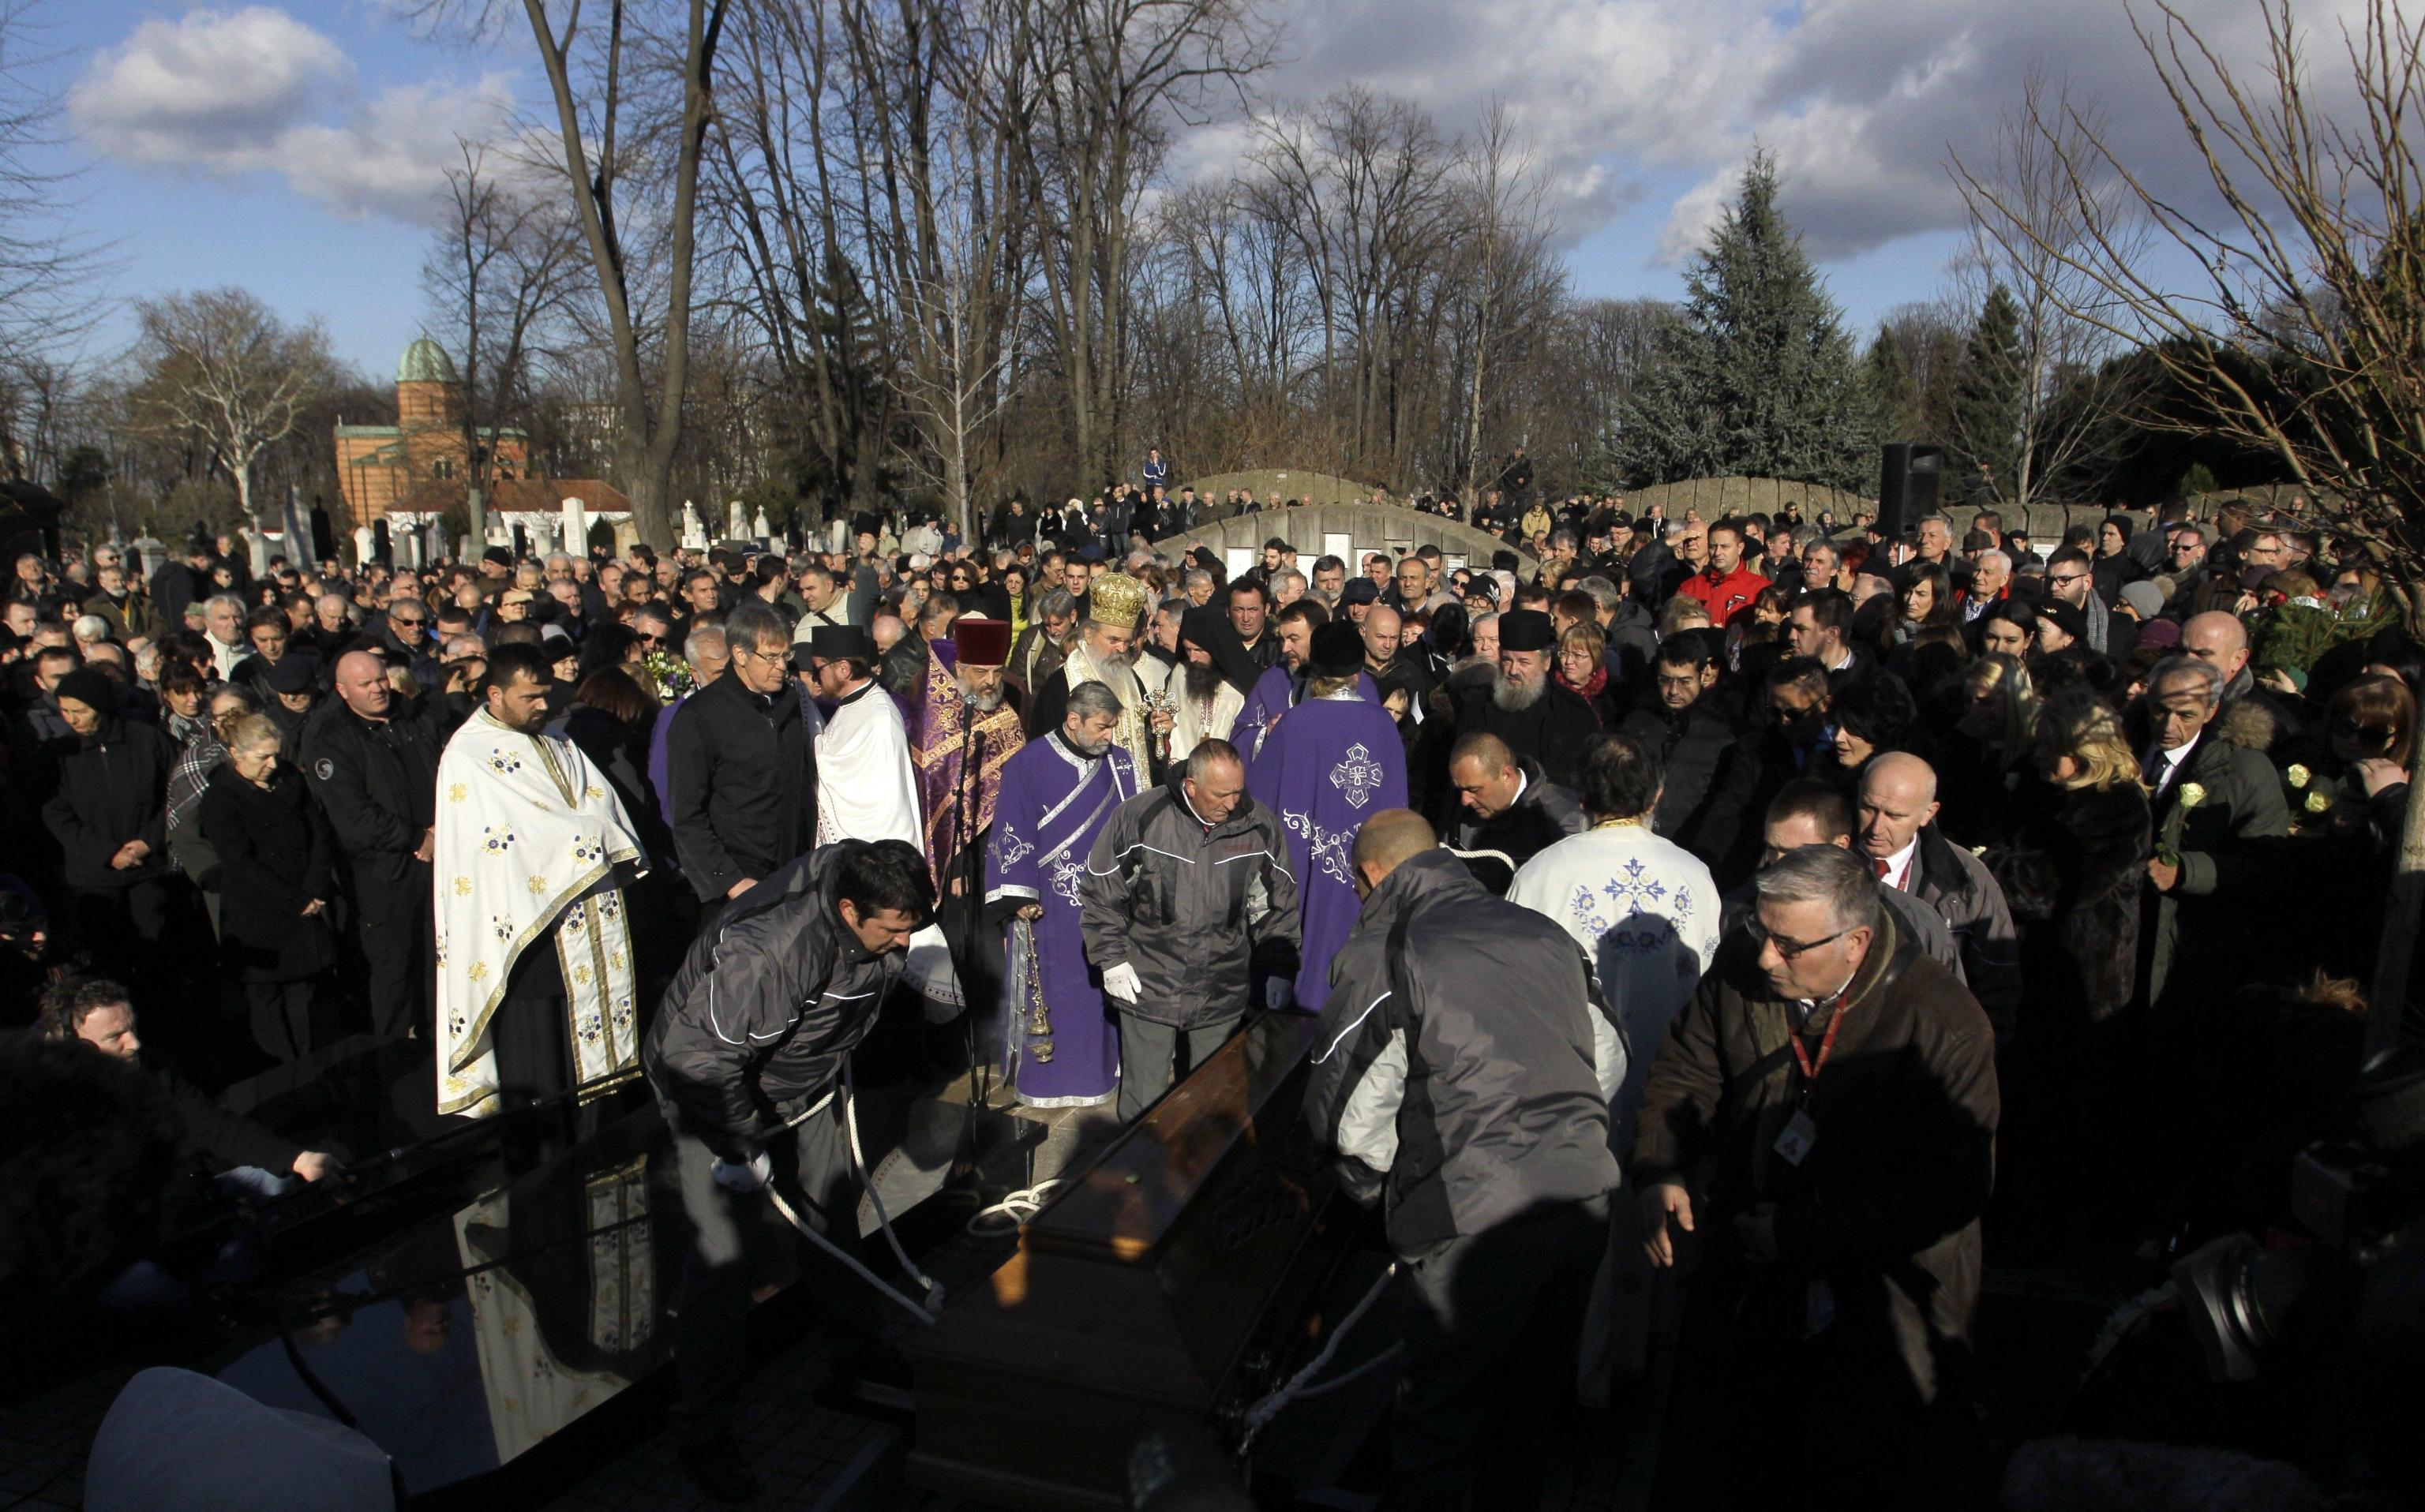 Folla a Belgrado per funerali Ivanovic